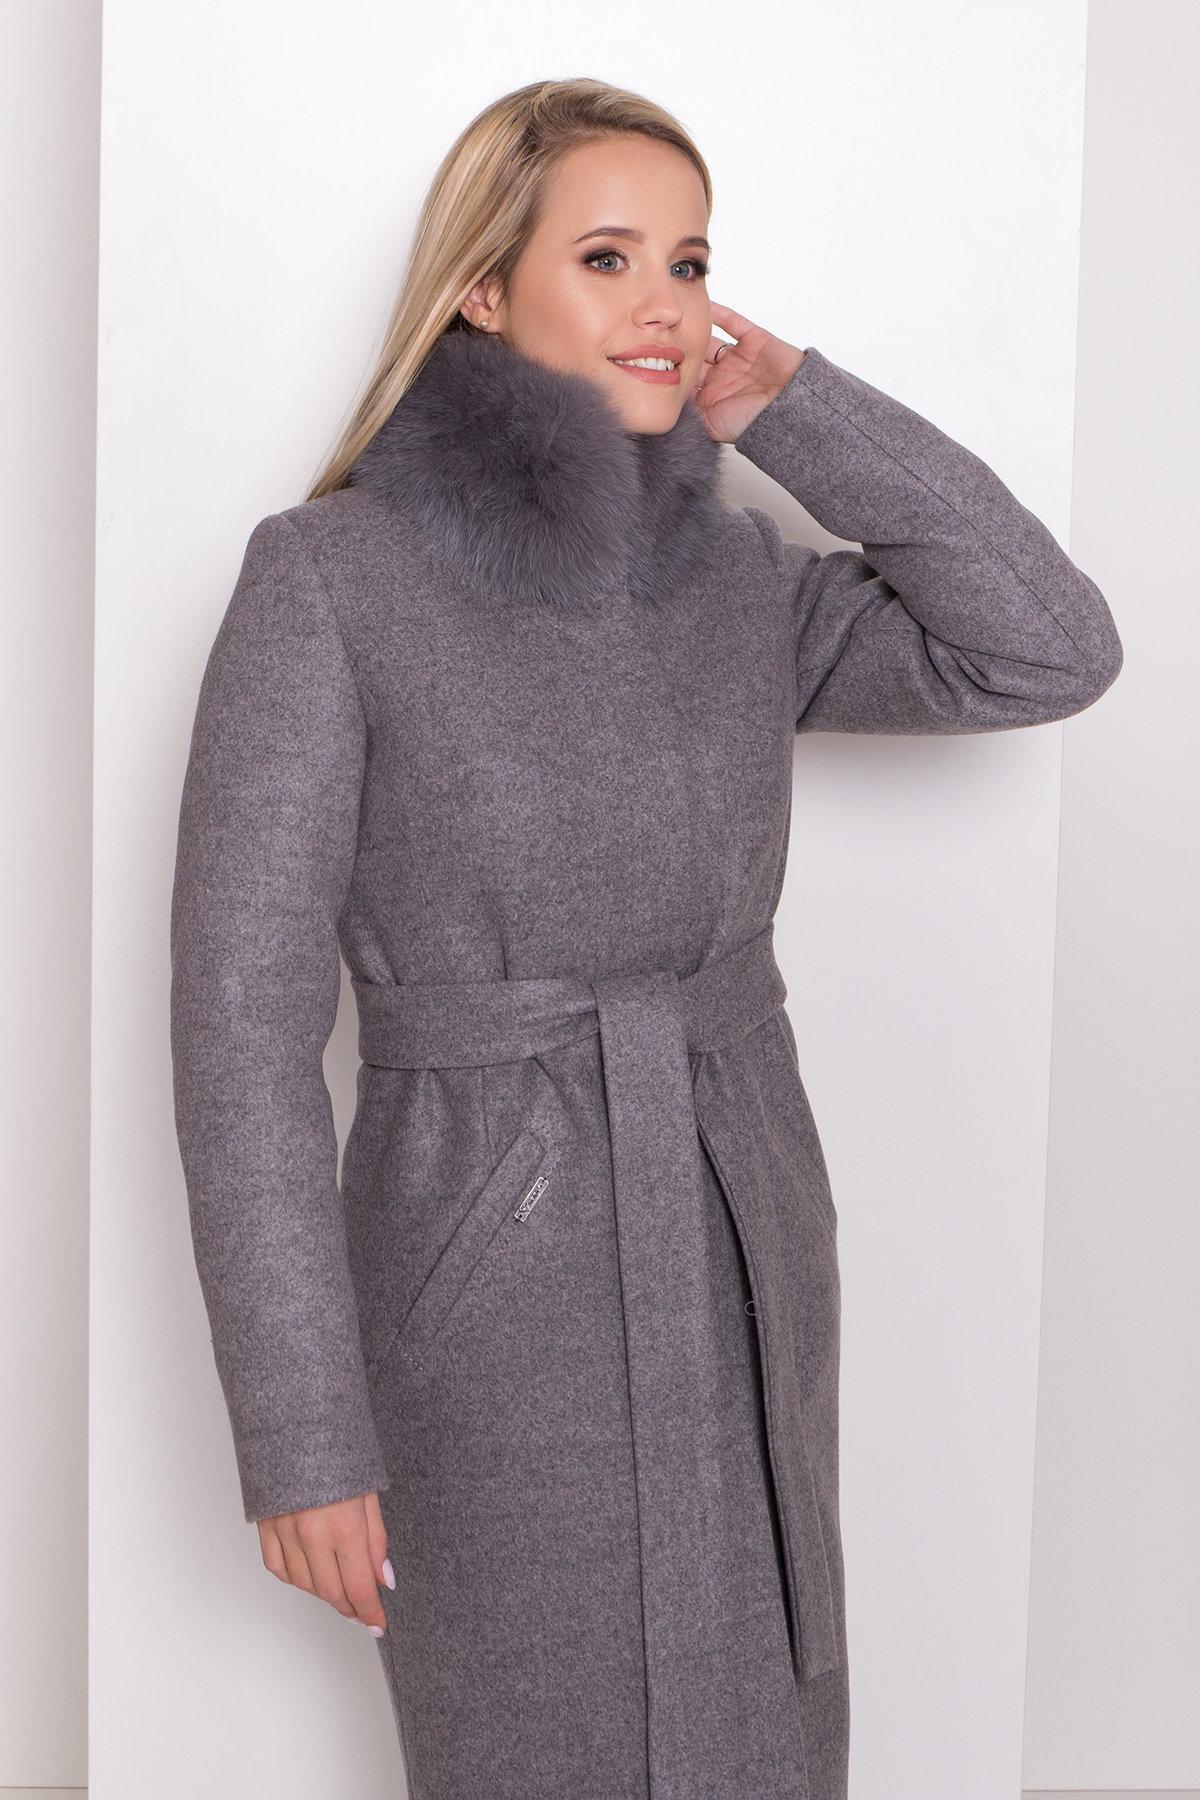 Утепленное пальто зима Люцея 8417 Цвет: Карамель 20